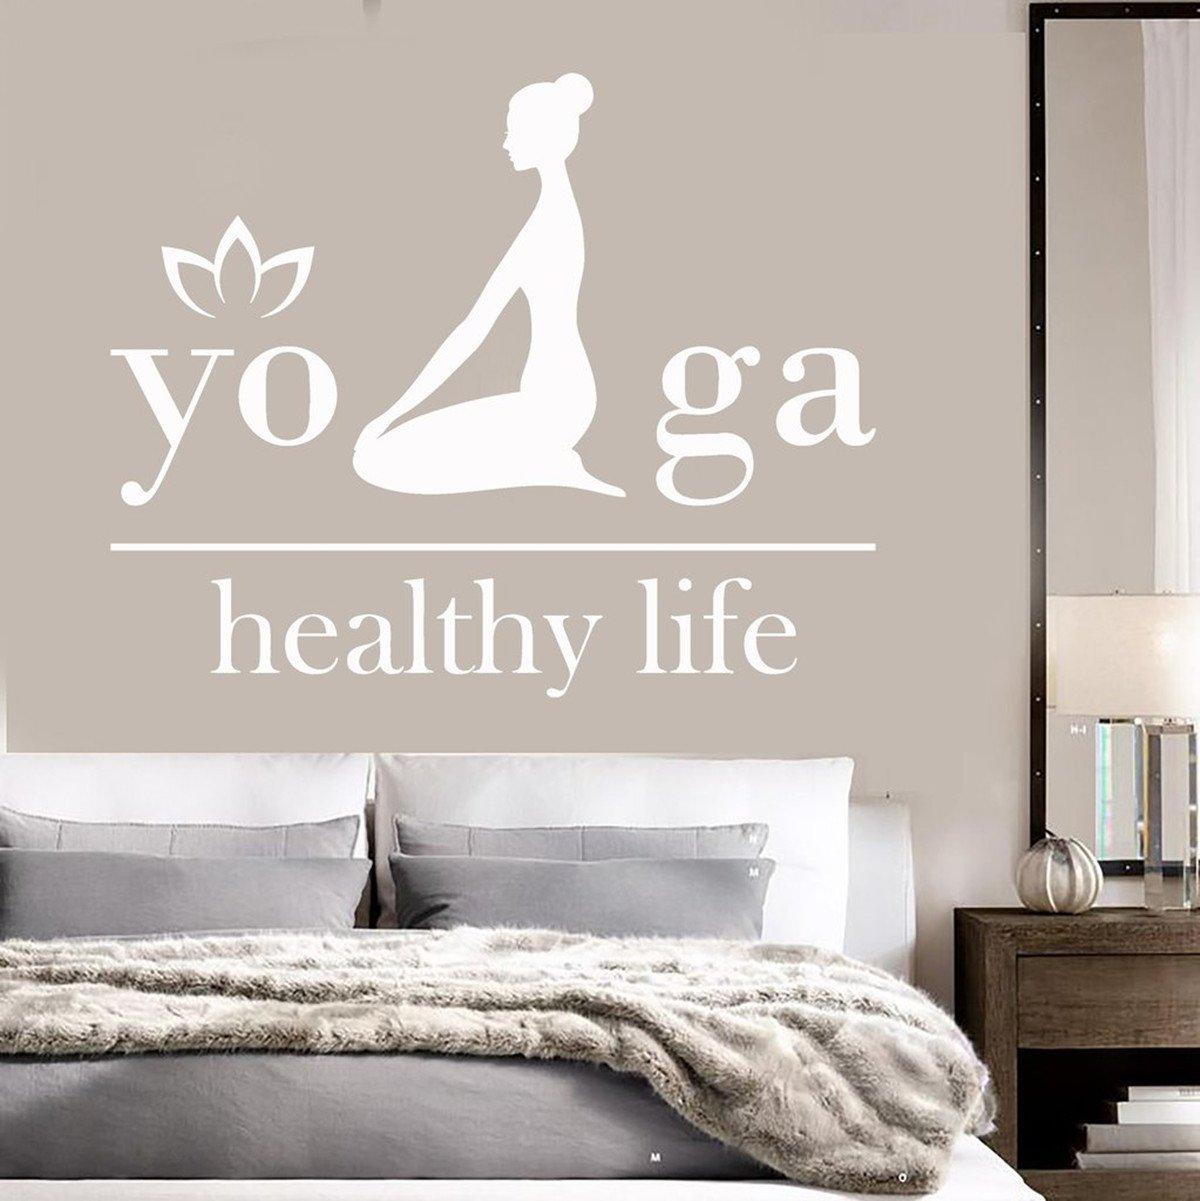 Amazon.com  wonbye Yoga Wall Stickers Meditation Vinyl Lotus for Girls Women  Wall Decal Home Bedding Decor Nursery Wall Mural Letter Healthy Life(39